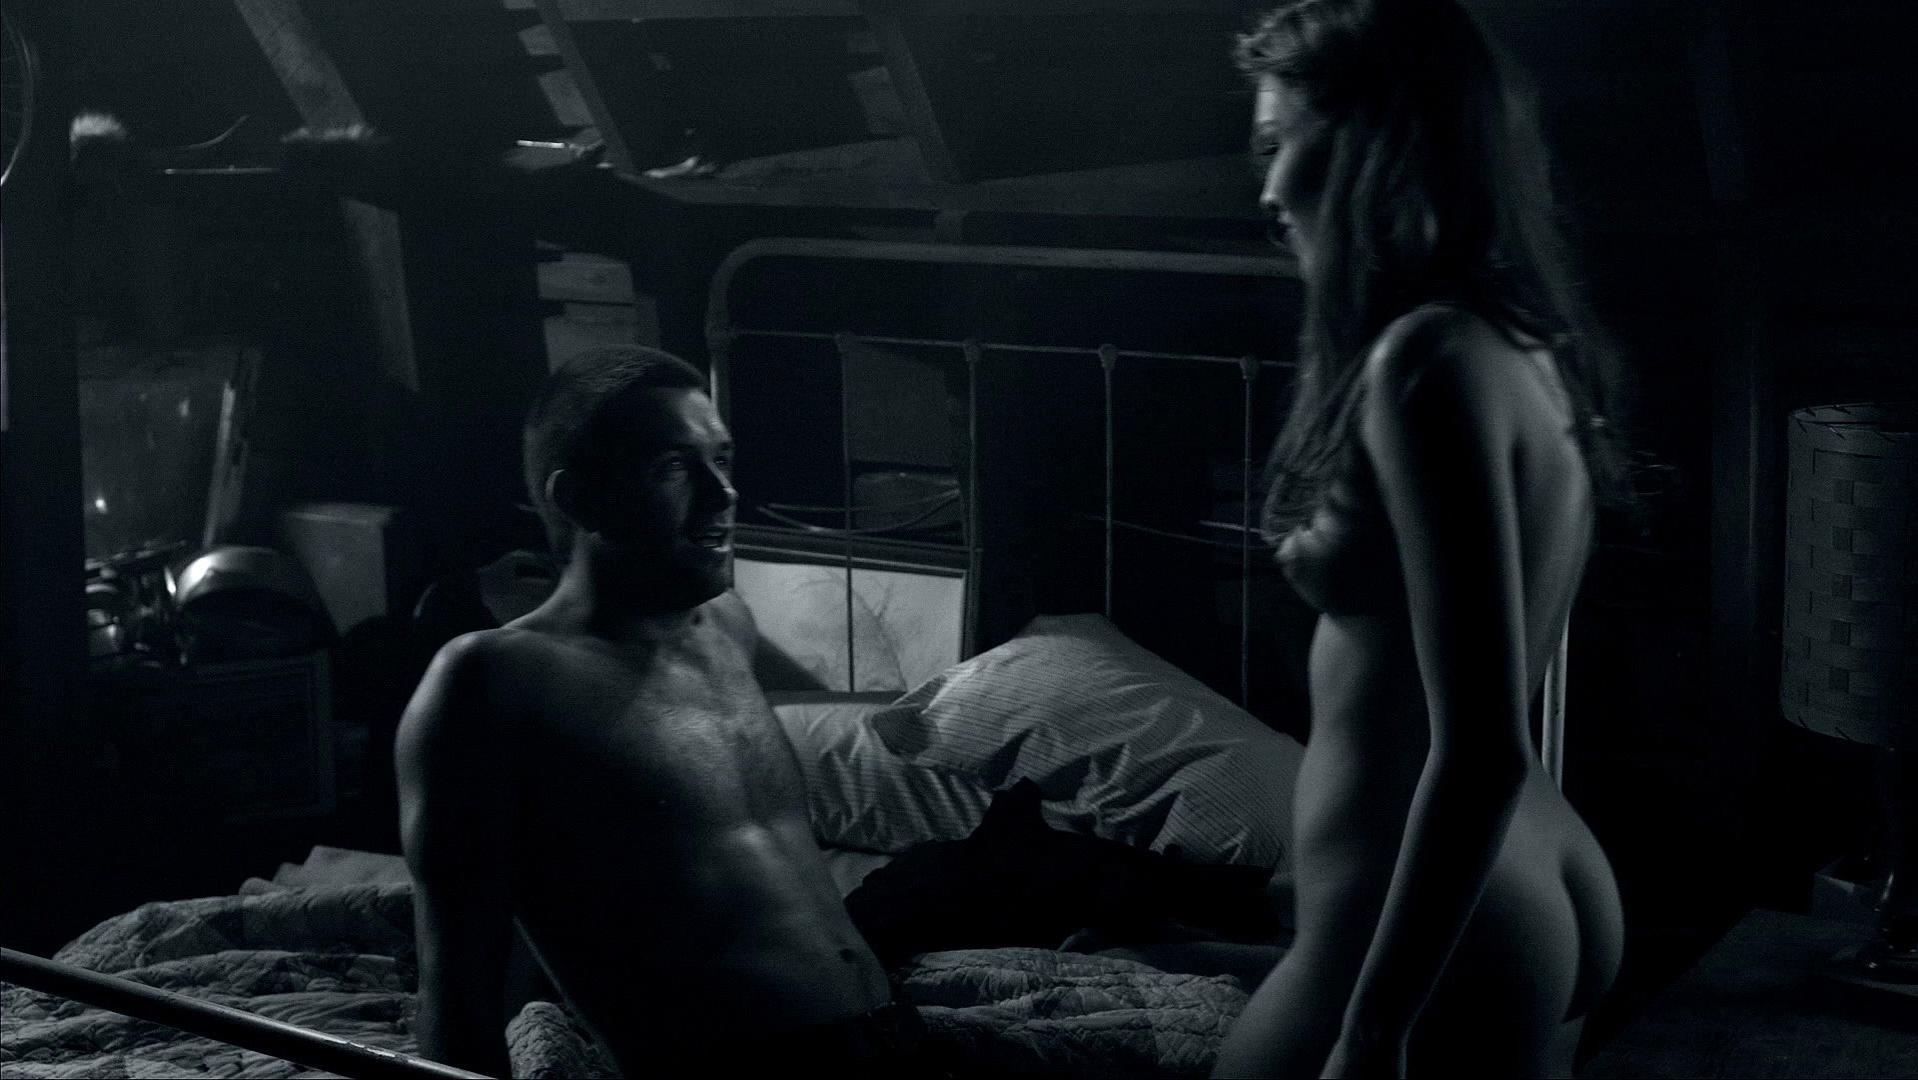 Lili Simmons nude - Banshee s02e02 (2014)